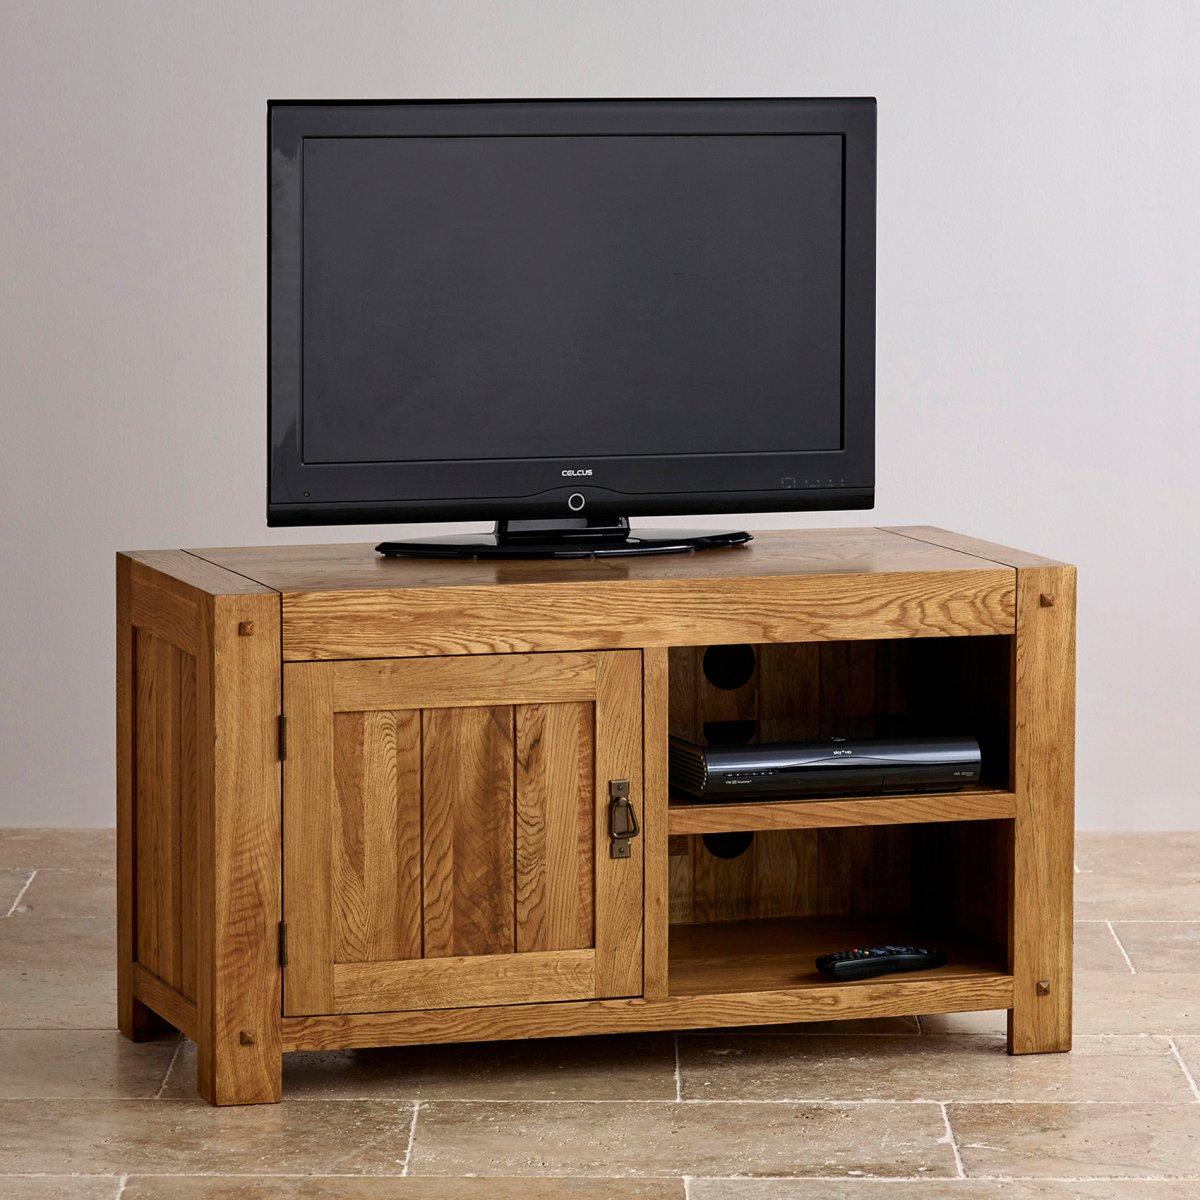 Quercus tv cabinet in rustic solid oak furniture land